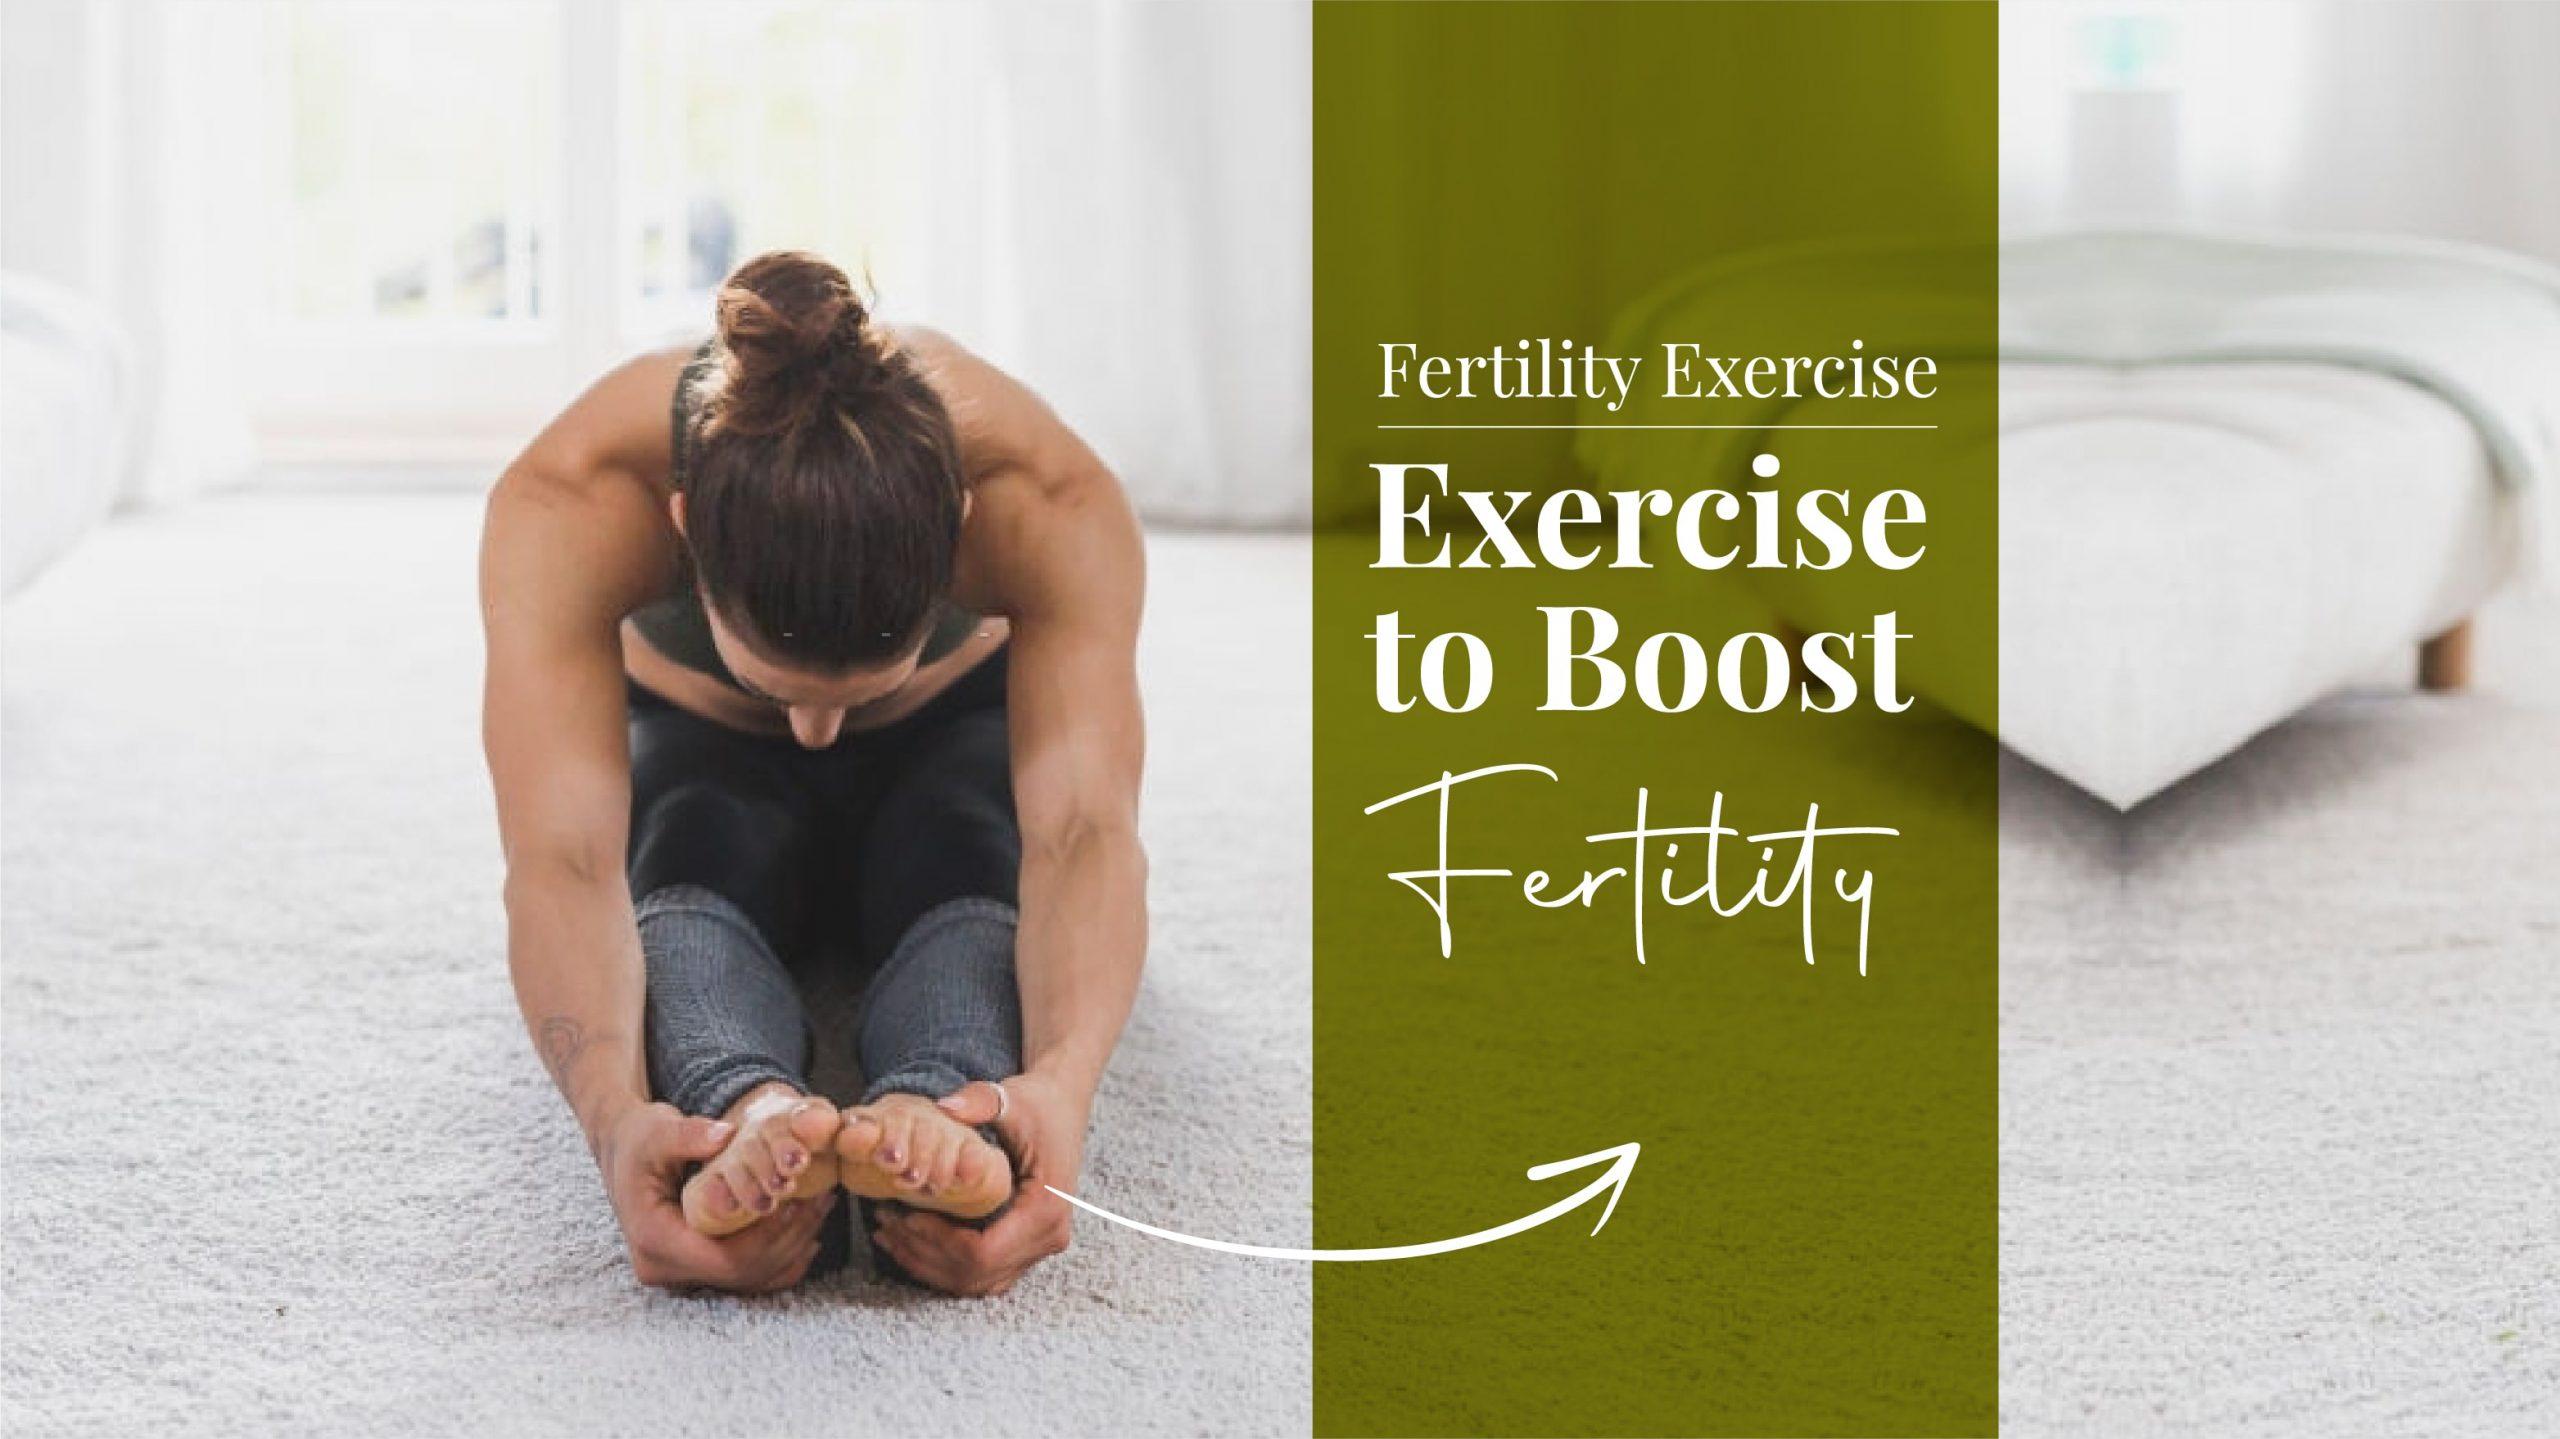 Fertility Exercise: Exercise to Boost Fertility